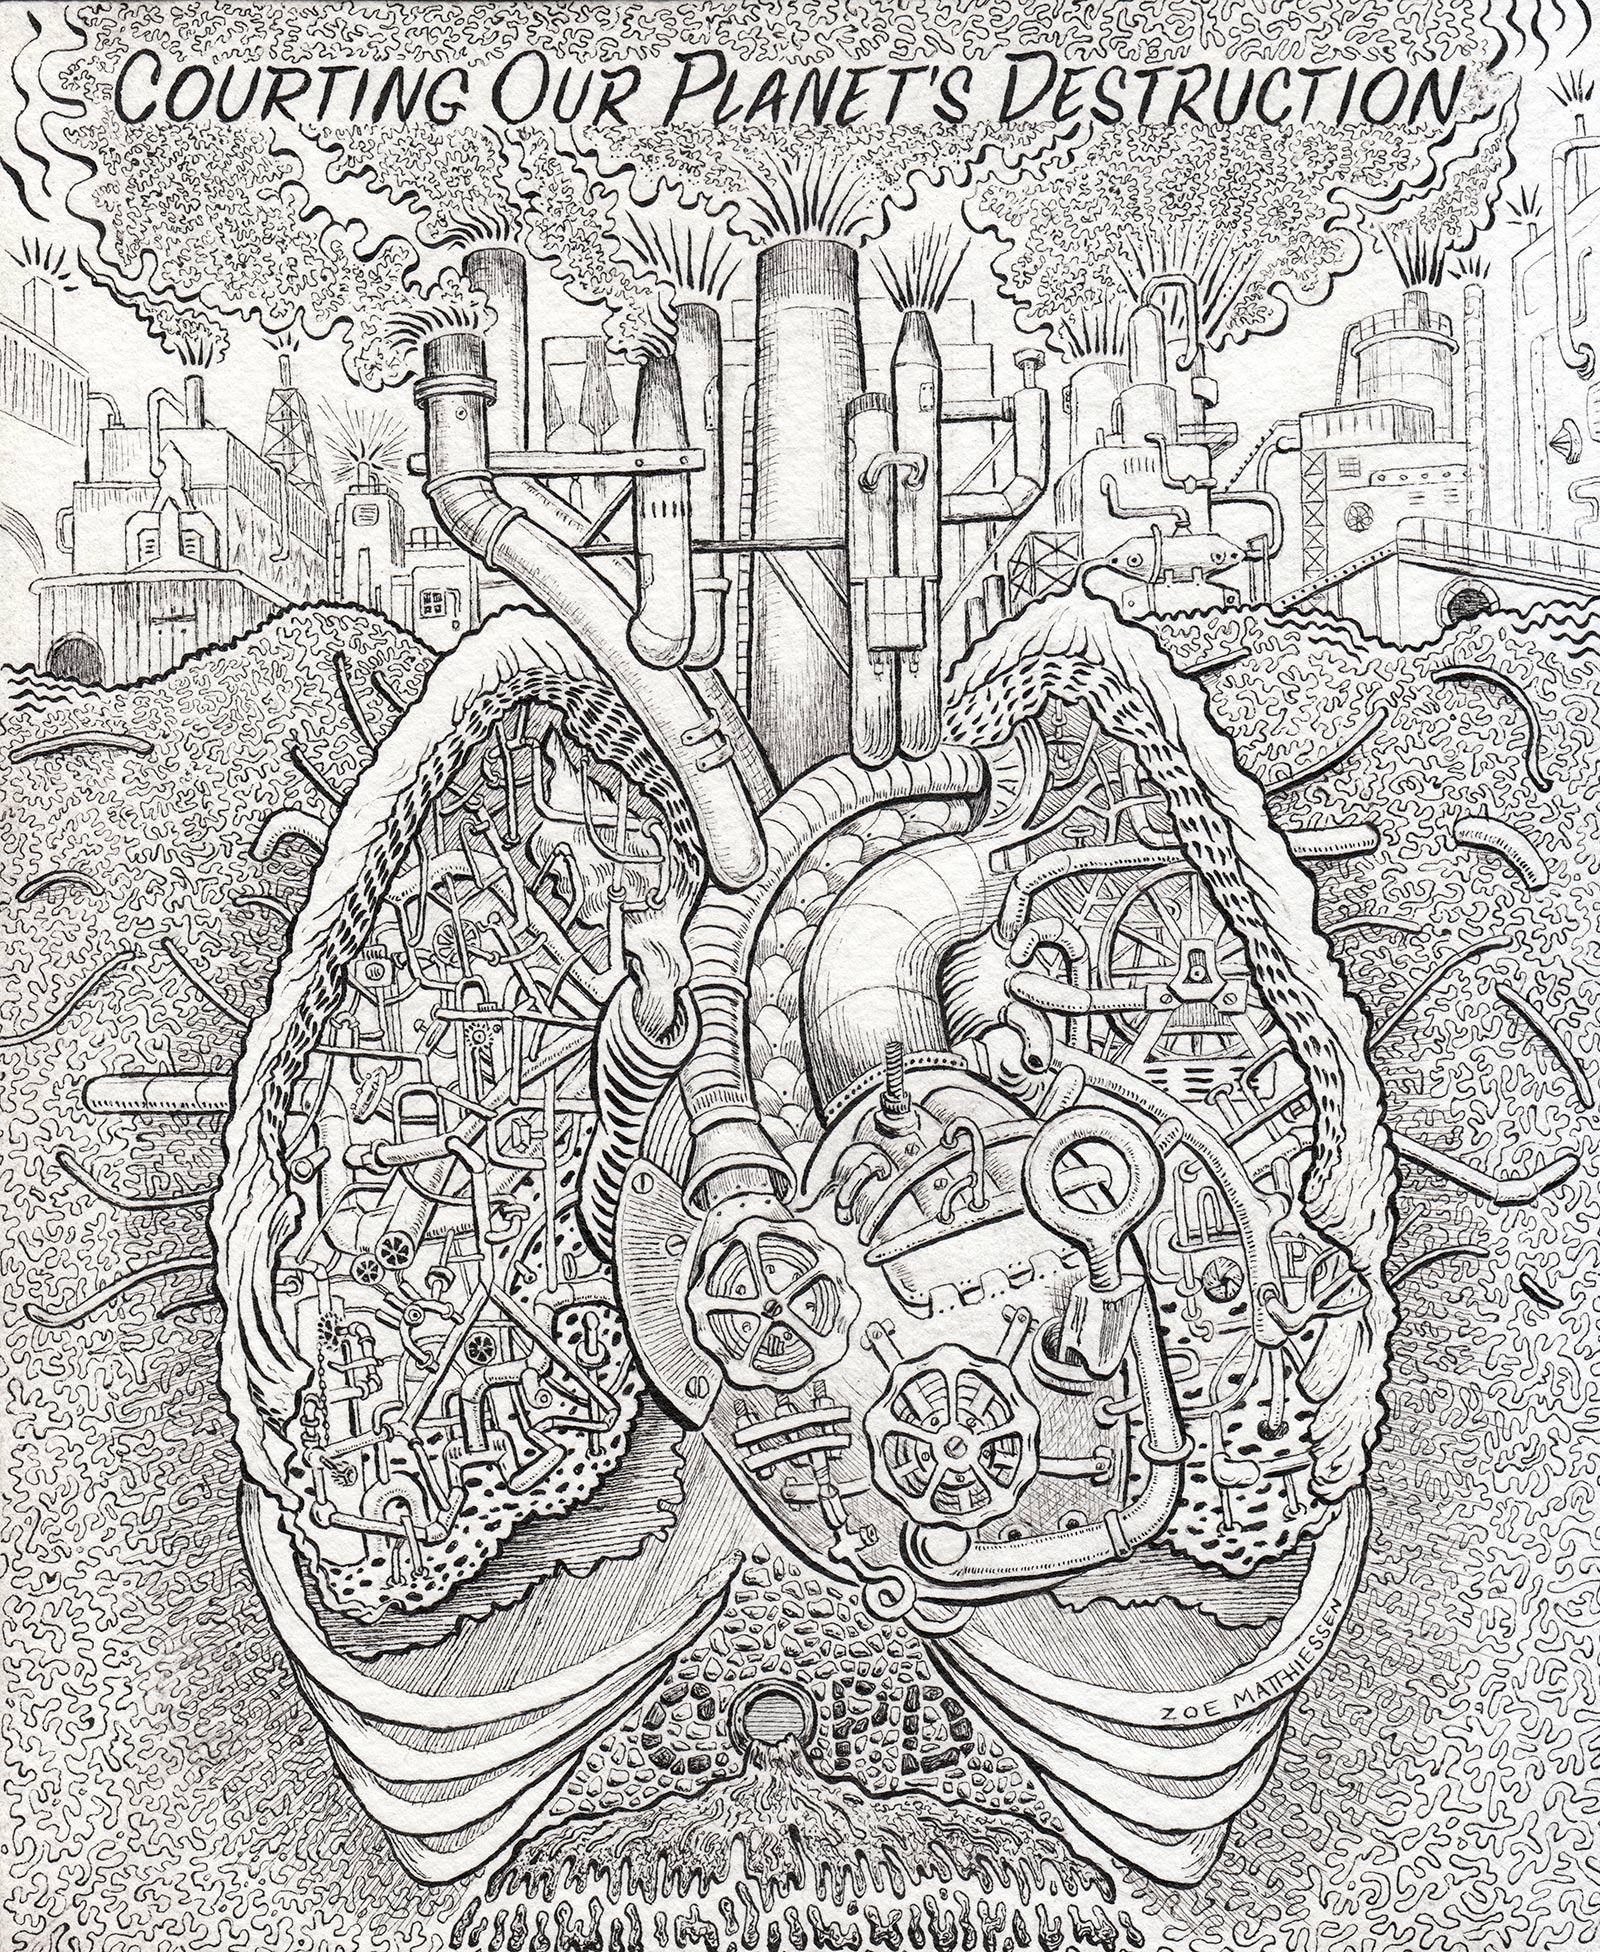 COPD - Environmental Defense Fund